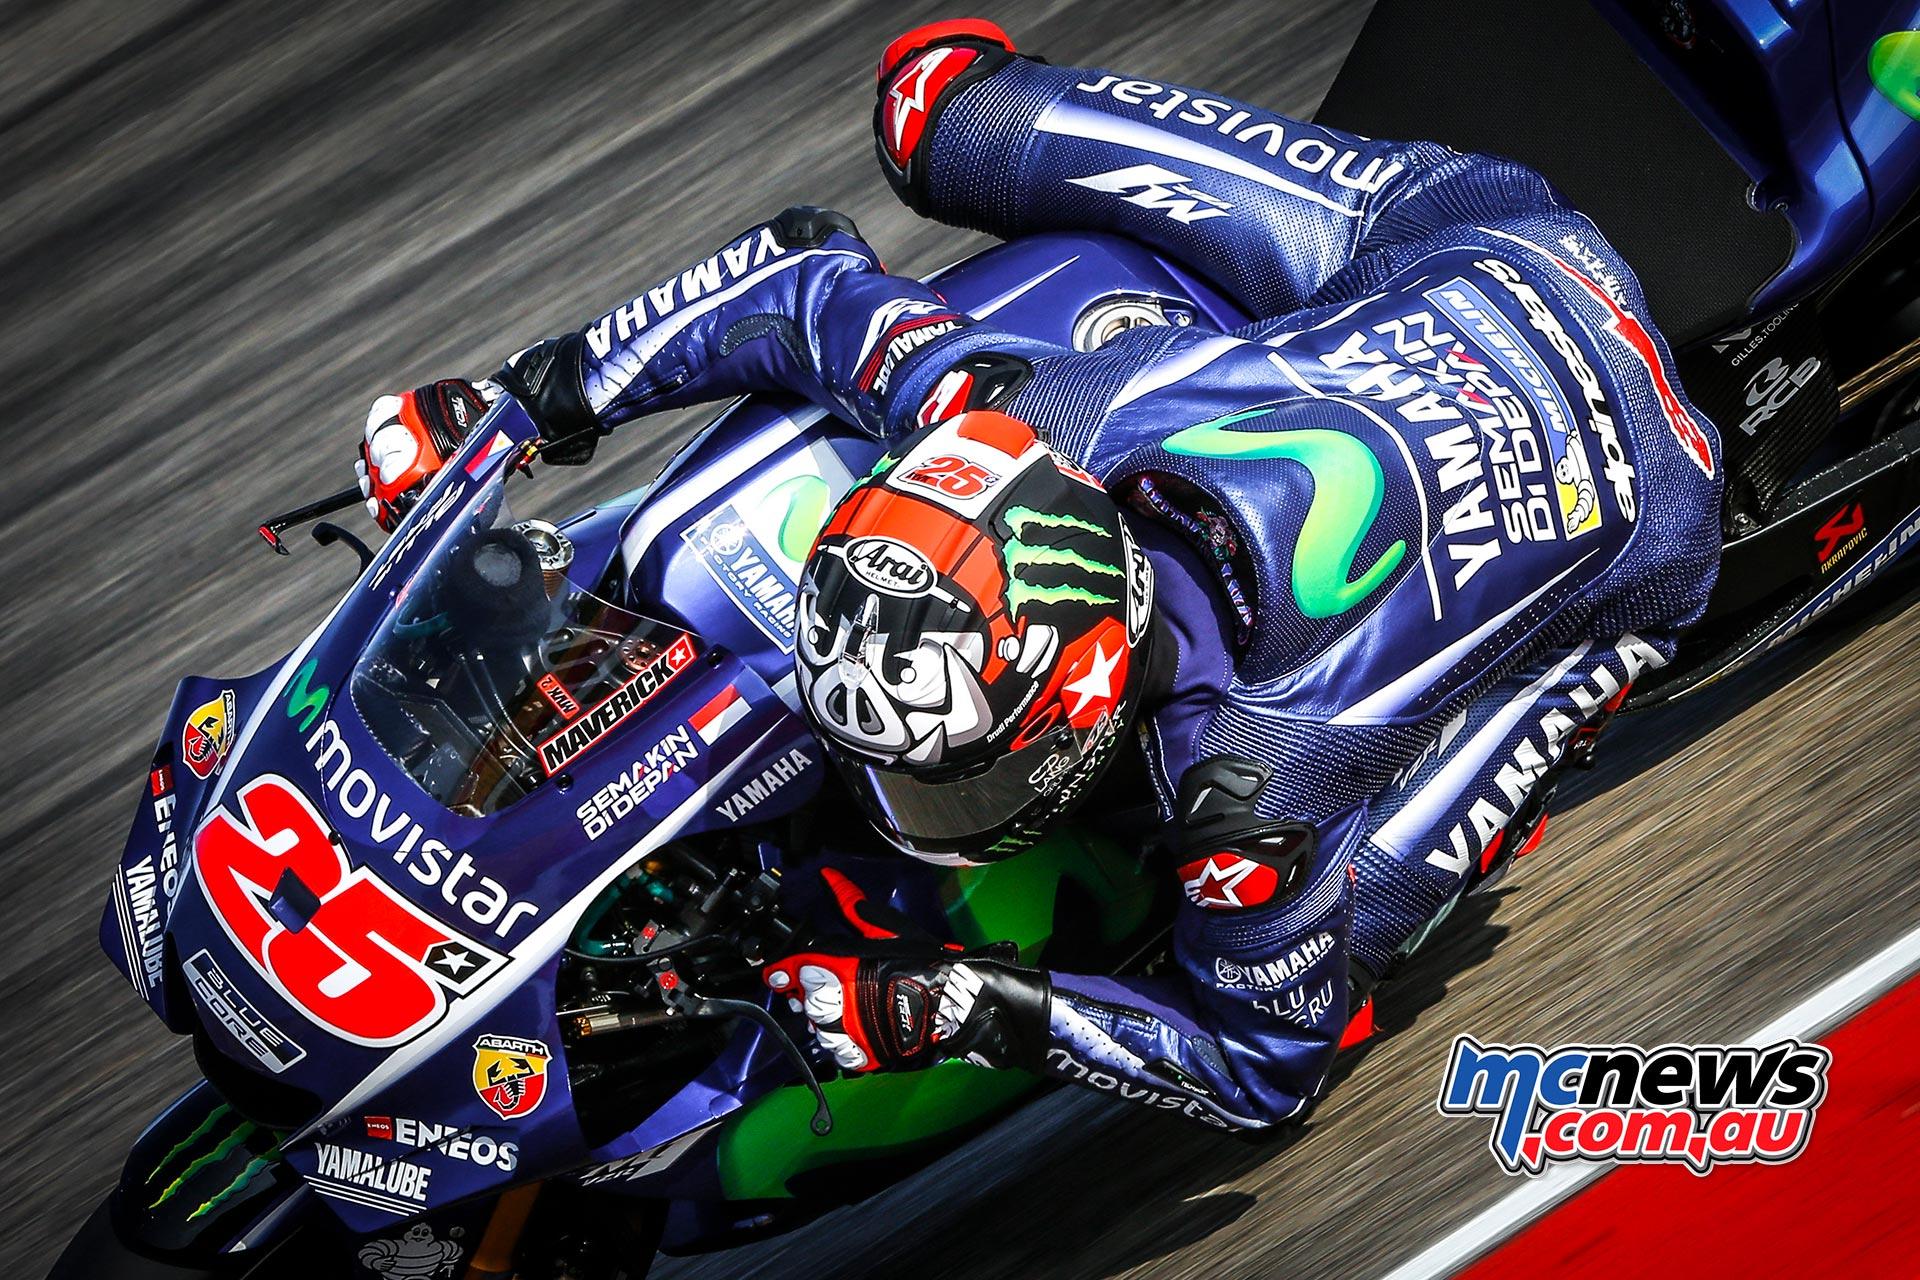 Motogp Aragon Qualifying Results | MotoGP 2017 Info, Video, Points Table